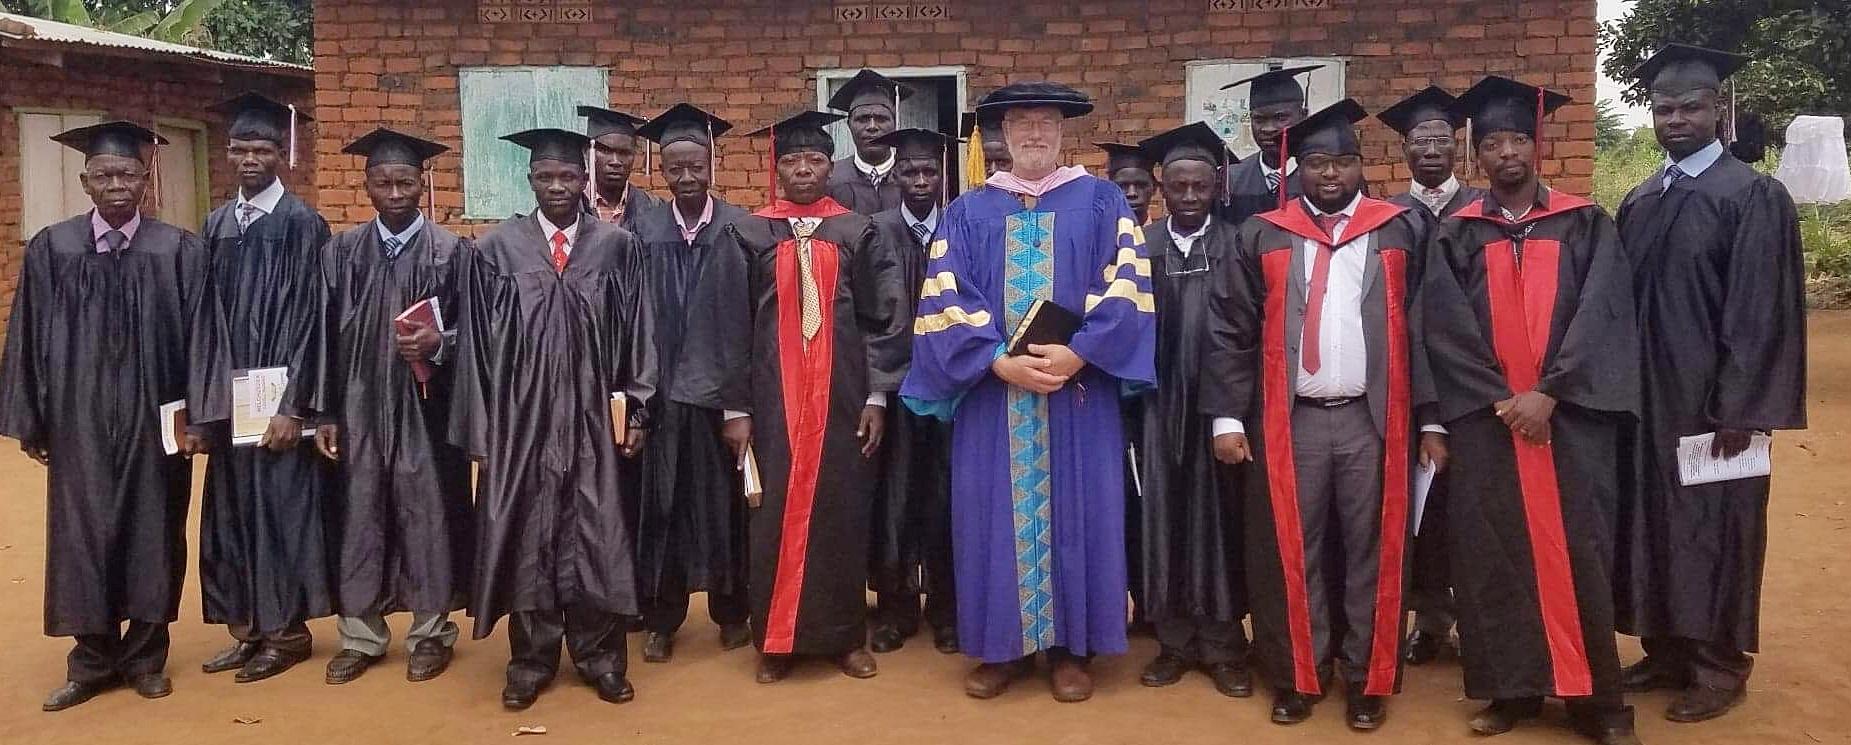 Graduating Class, July 2018, with Dr. Bob Barton, USA